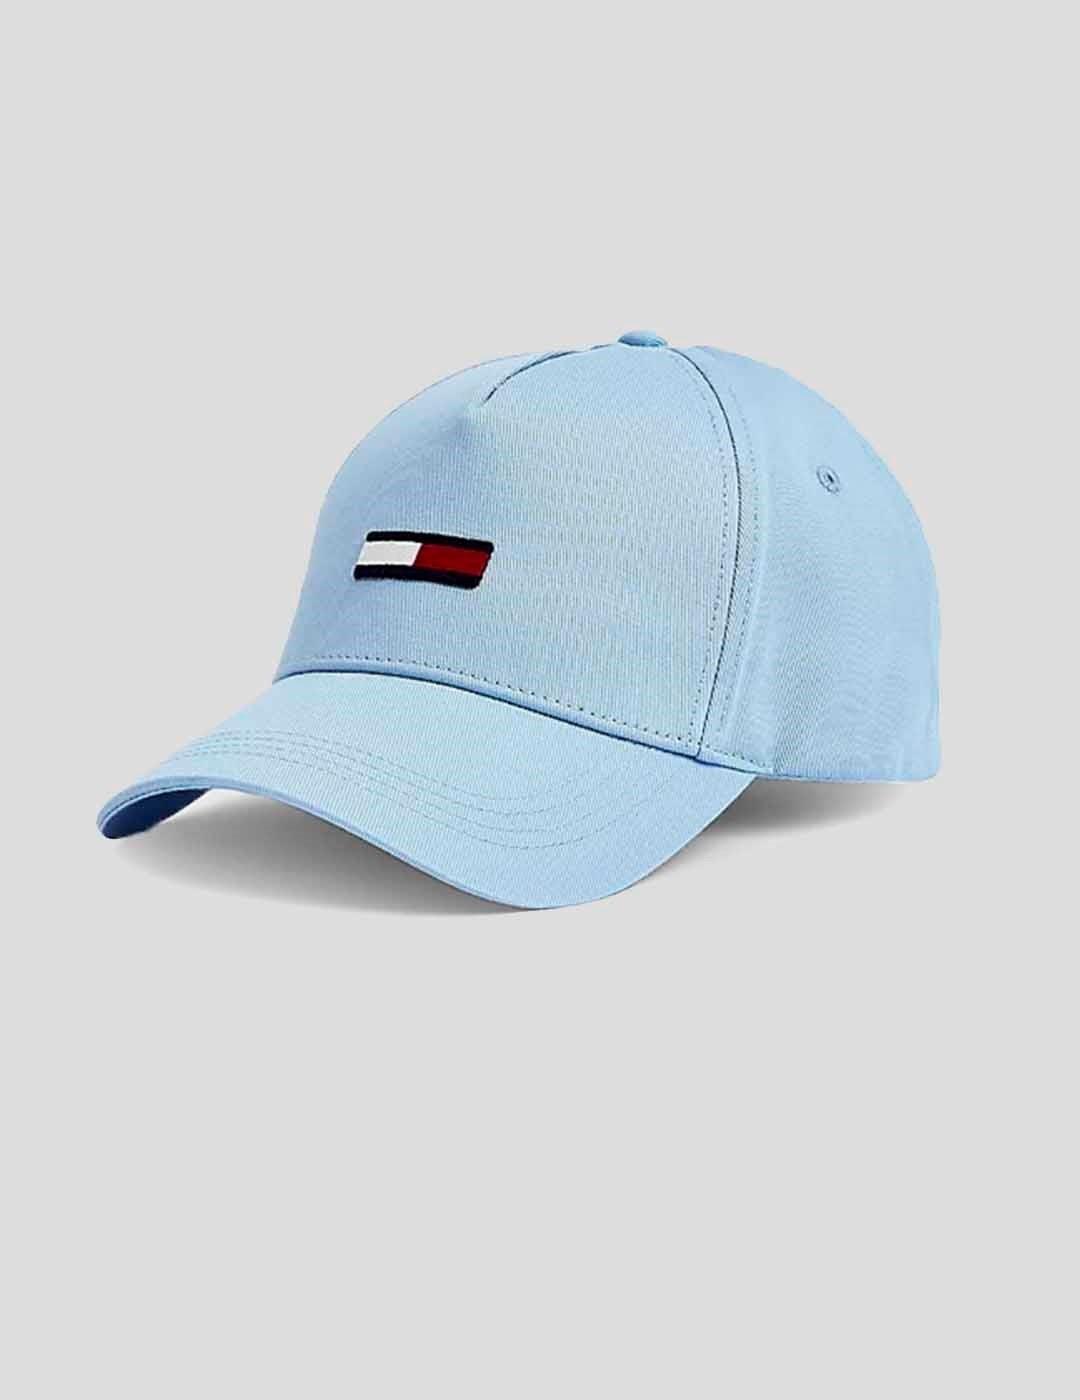 GORRA TOMMY JEANS PASTEL CAP BLUE